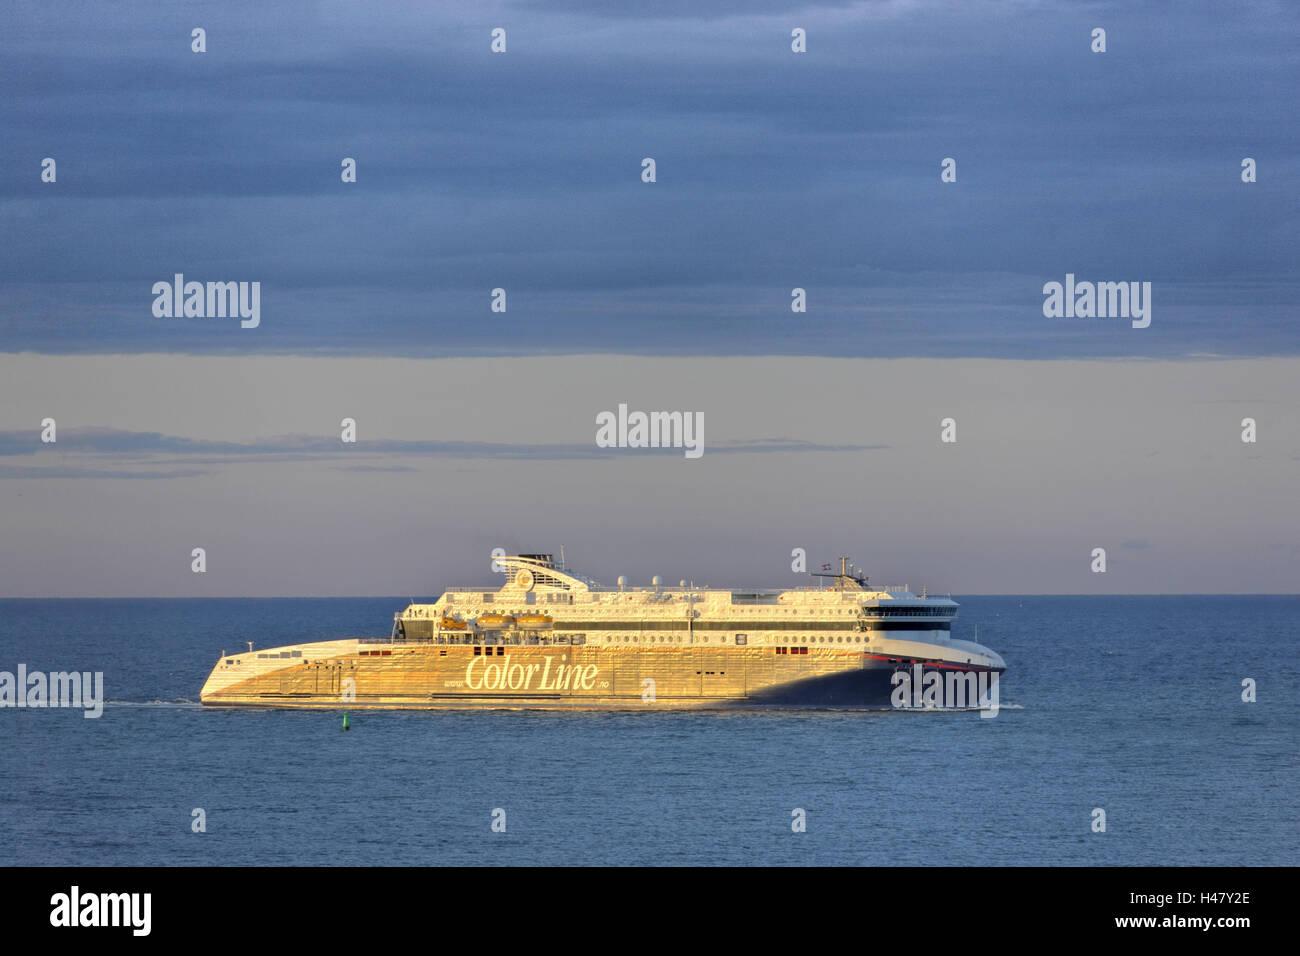 Denmark, Jutland, shepherd's neck, sea, ship, vehicle ferry, Kristiansand-shepherd's neck, cruise ship, - Stock Image